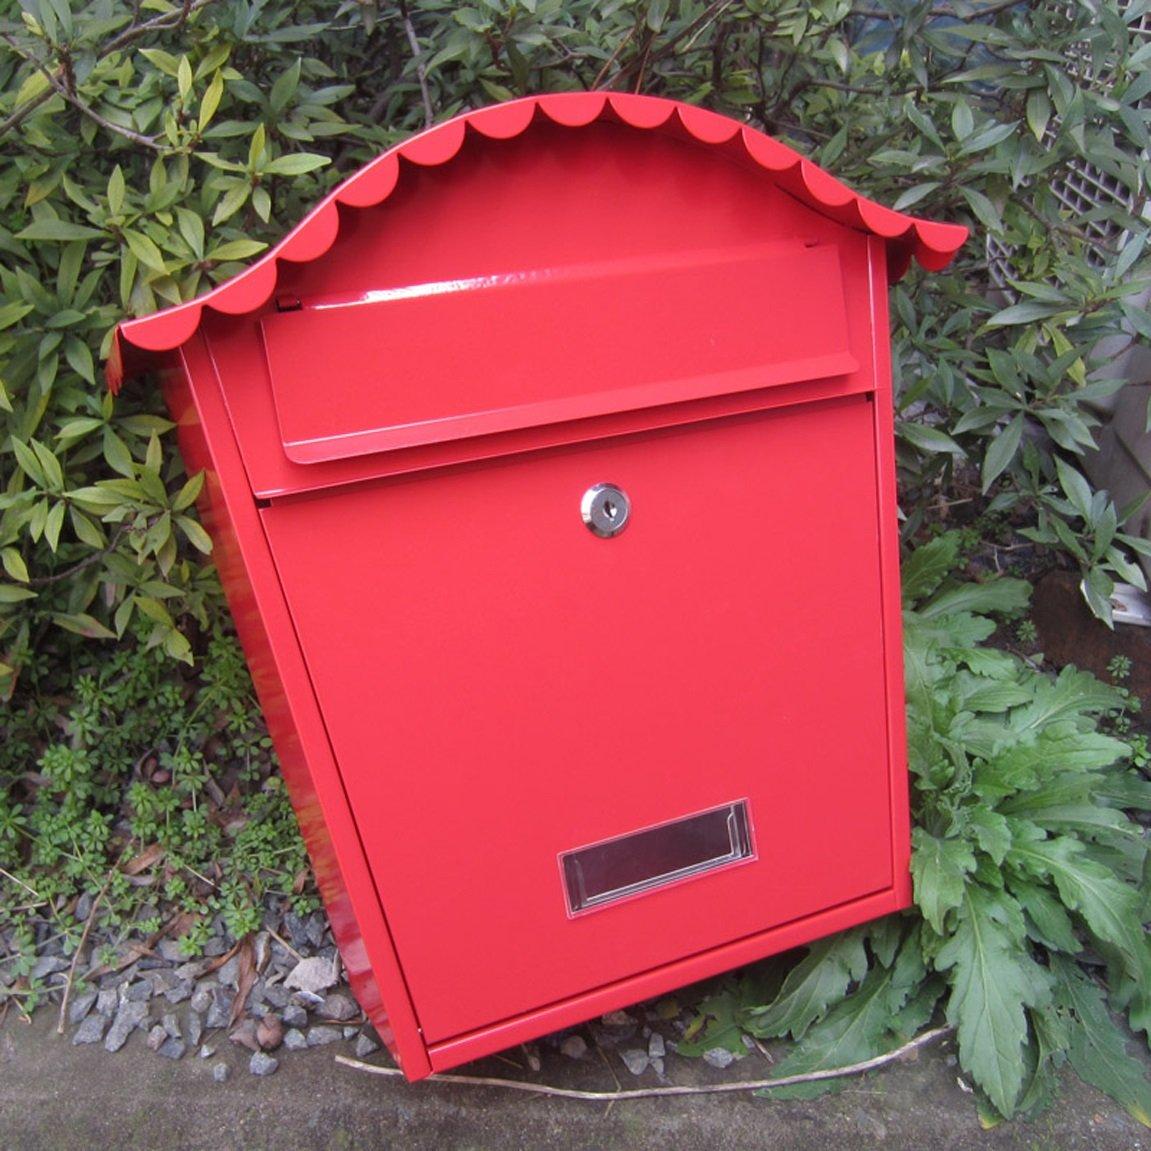 TLMY ヴィラのメールボックス屋外のメールボックスヨーロッパの壁ロック製の新聞の箱の単純な壁の吊り下げと鉄の創造的な屋外防水 メールボックス   B07JBM8M6R